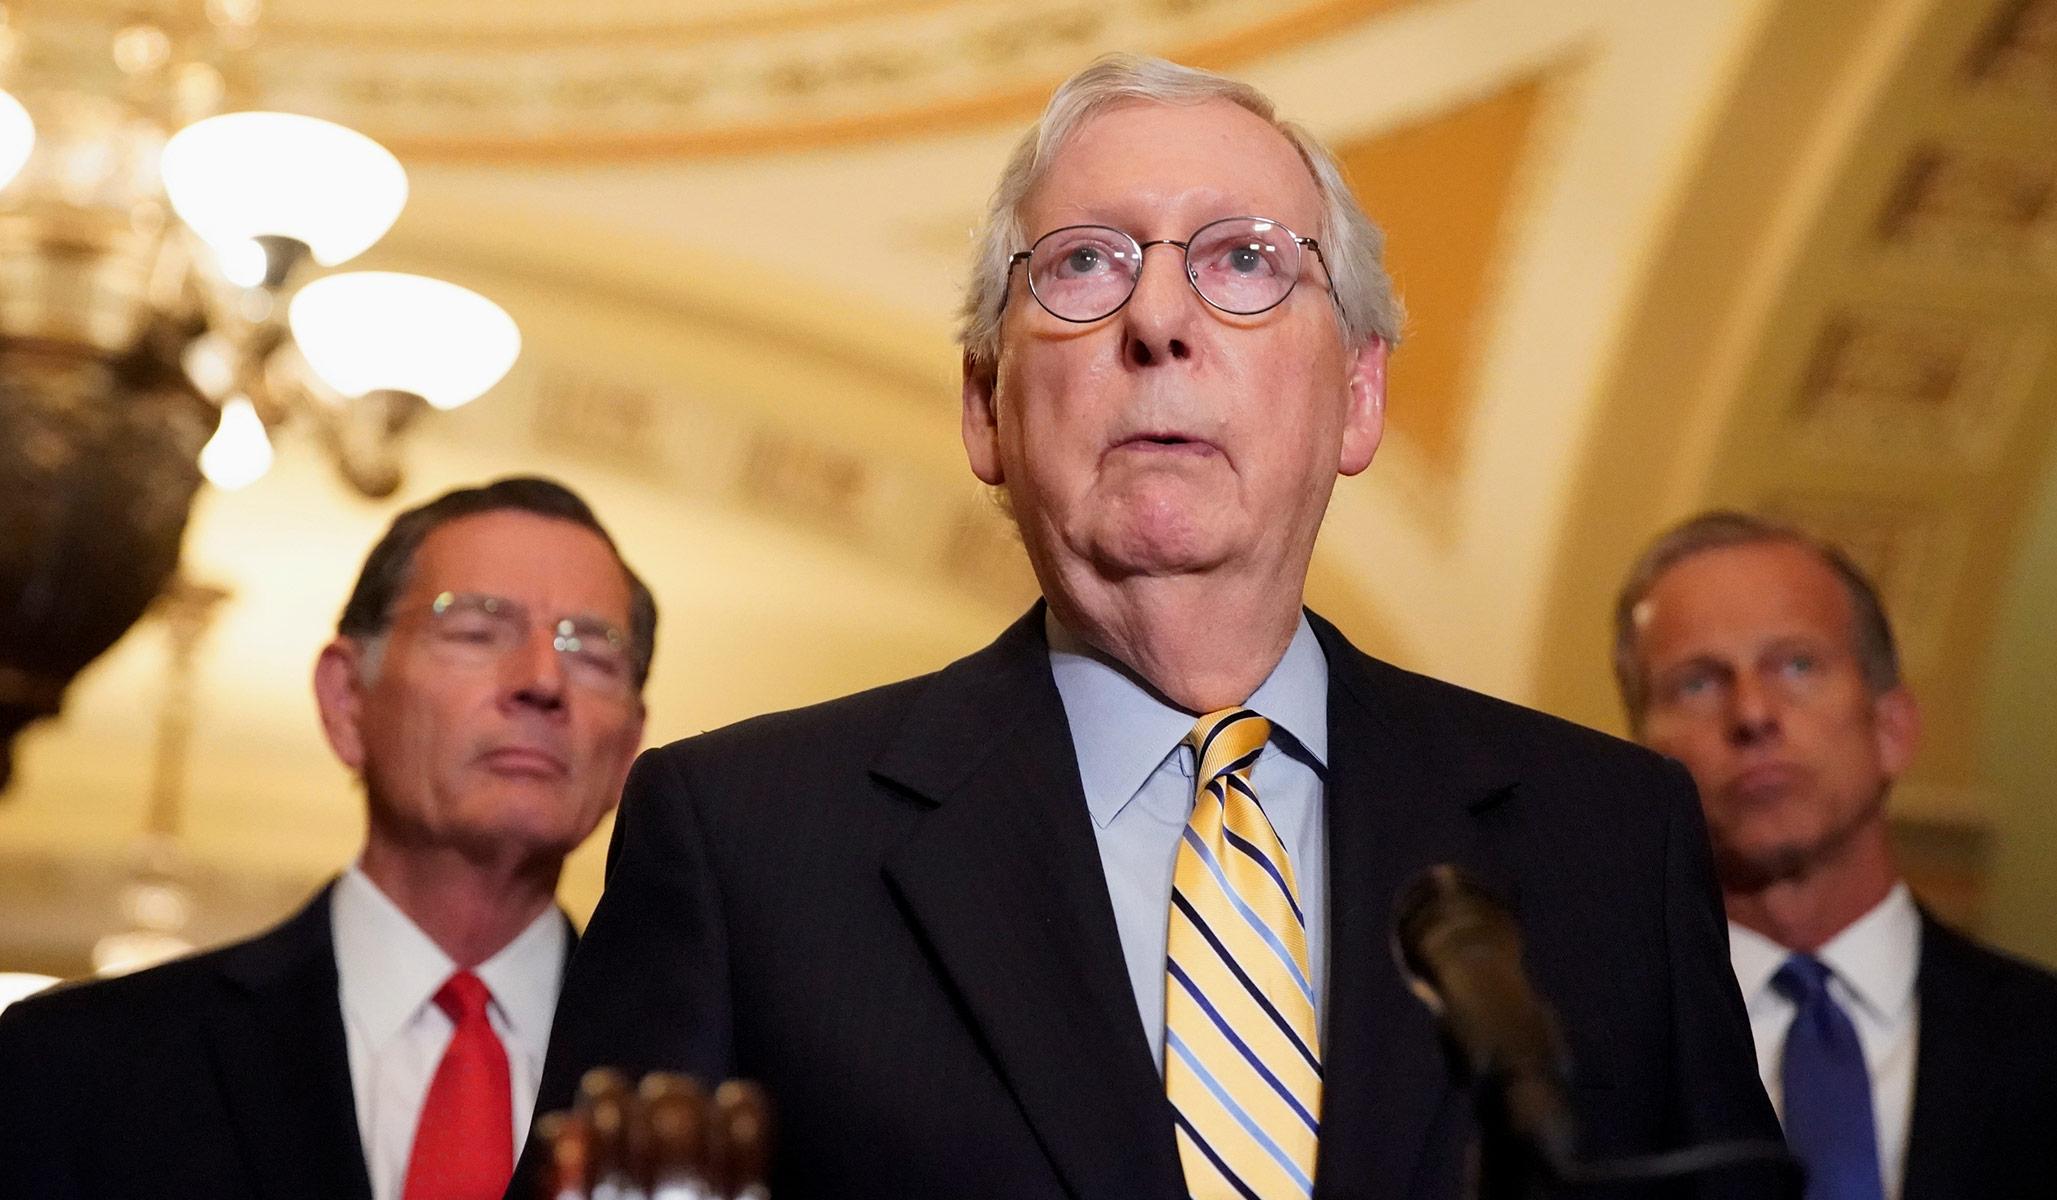 Senat Partai Republik Blokir Perdebatan Tentang RUU Pemilu Demokrat